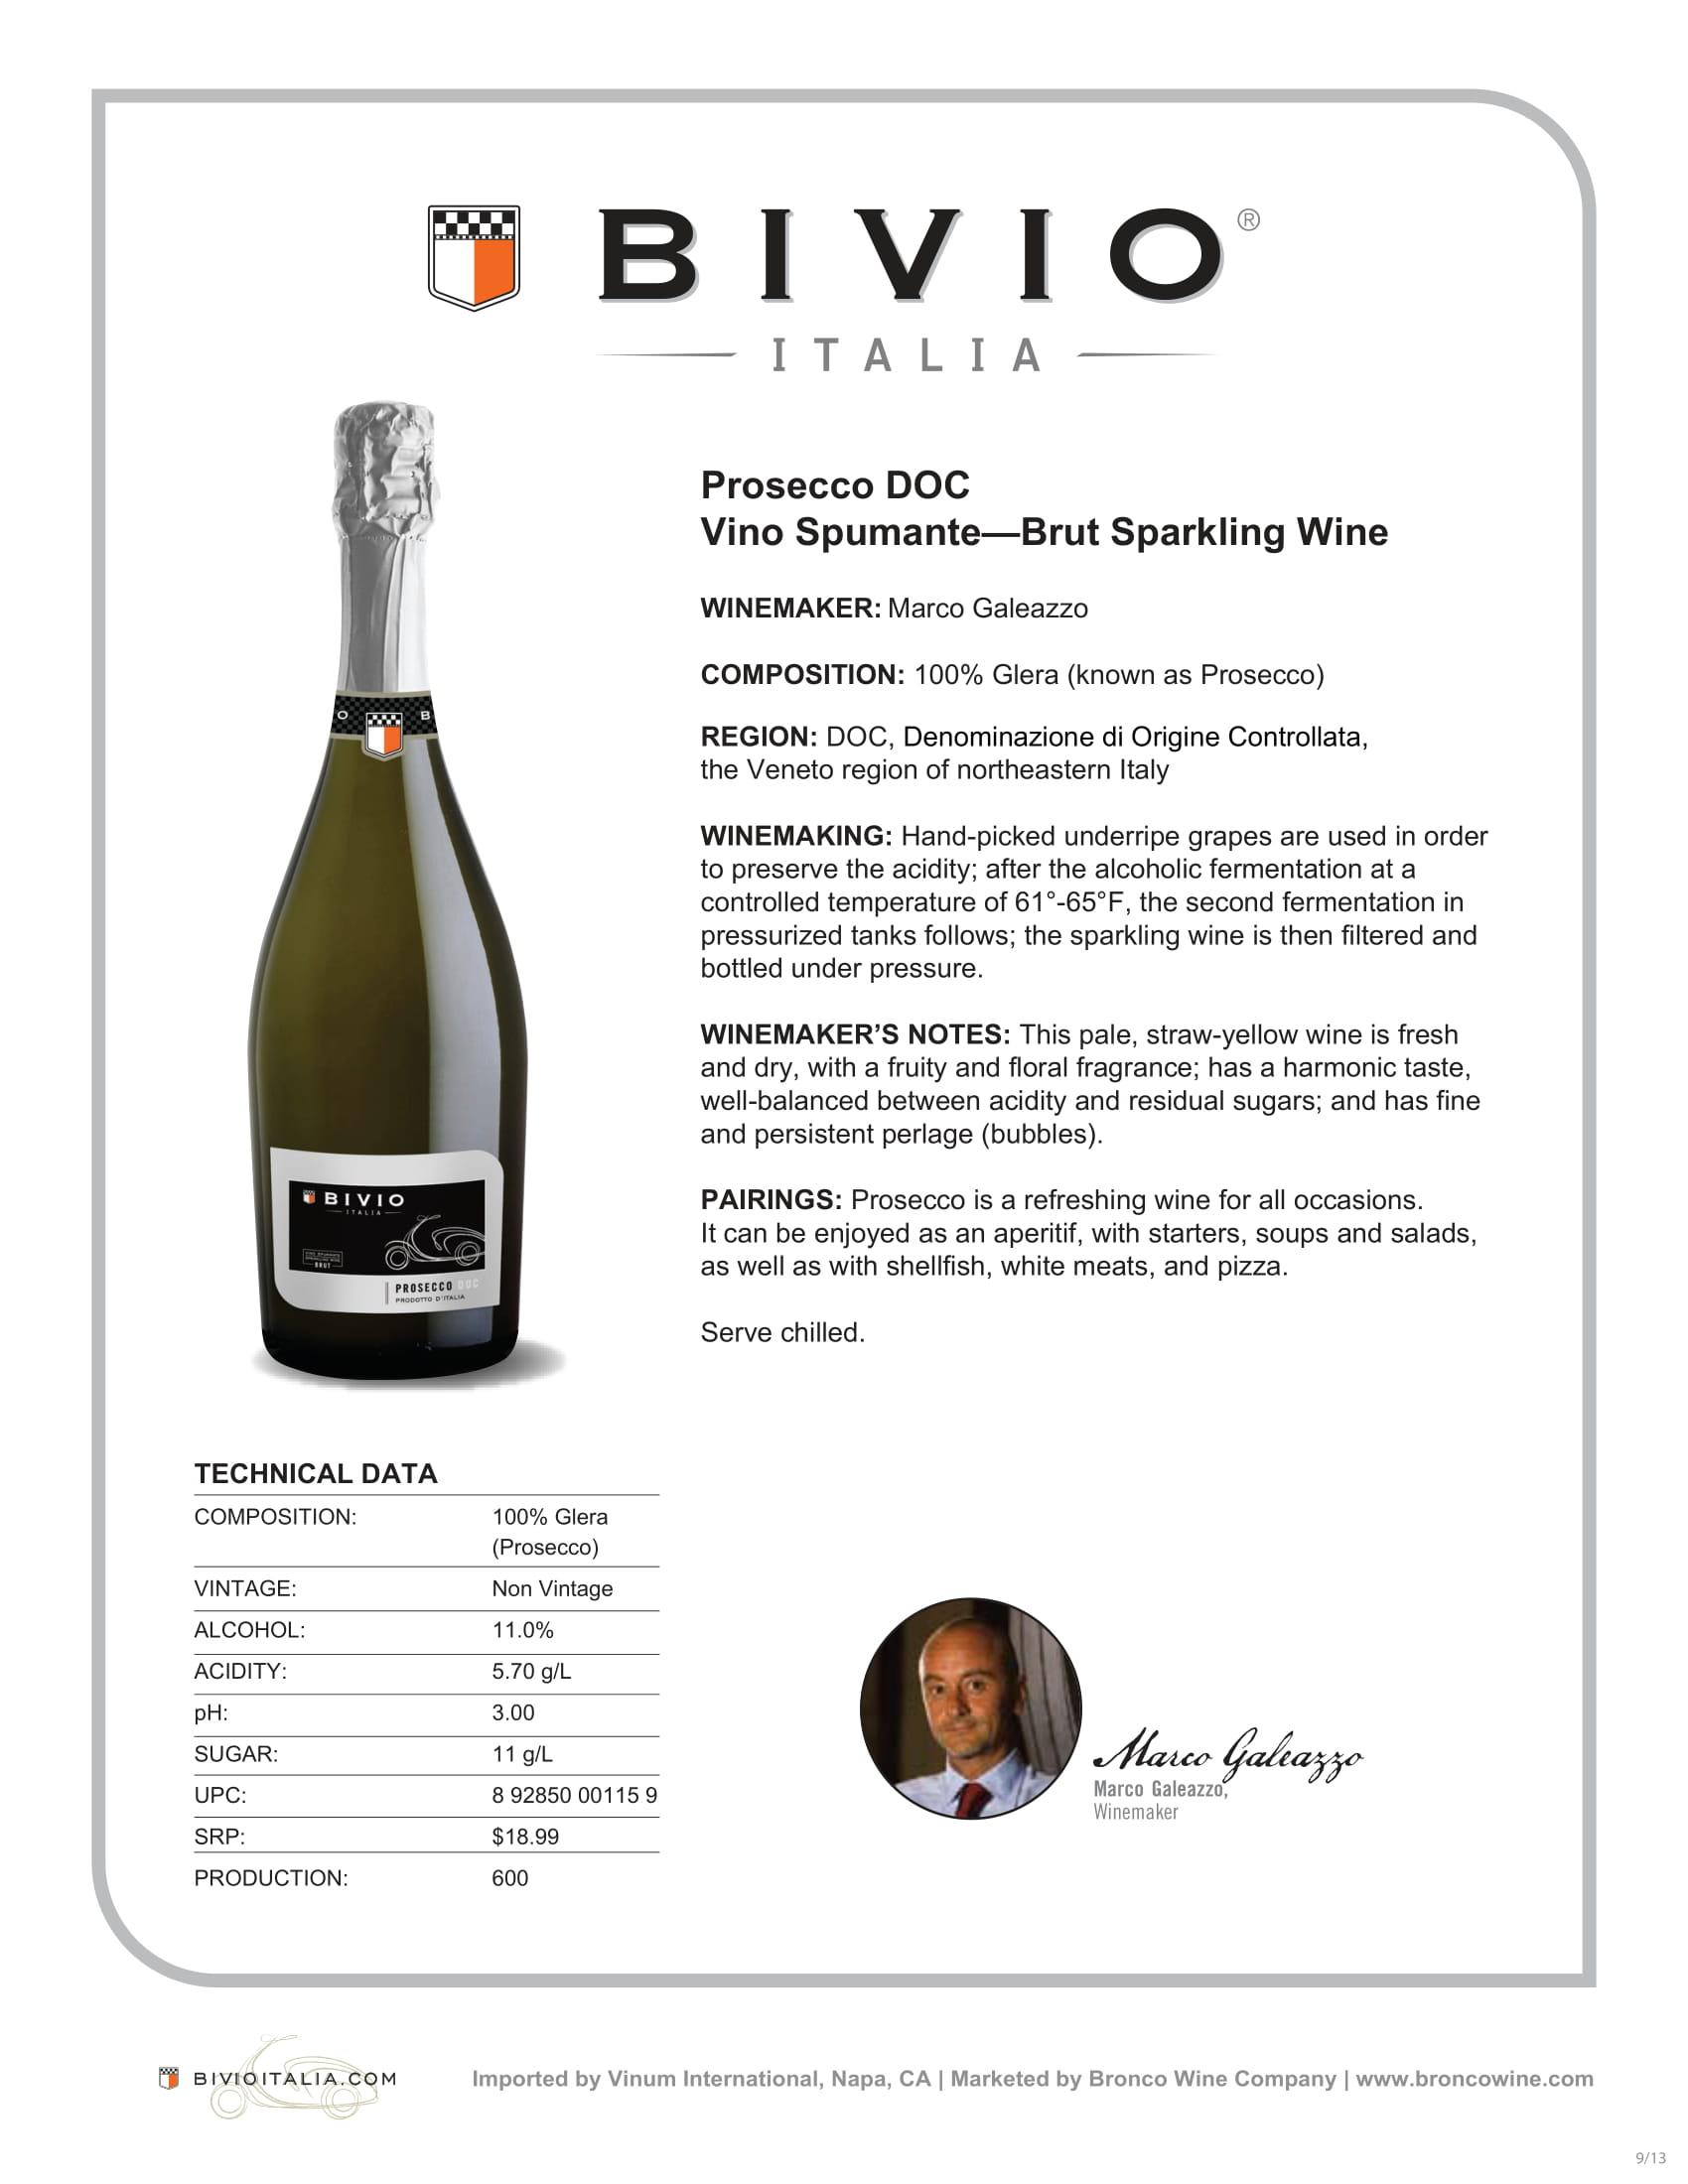 Bivio Prosecco Tech Sheet